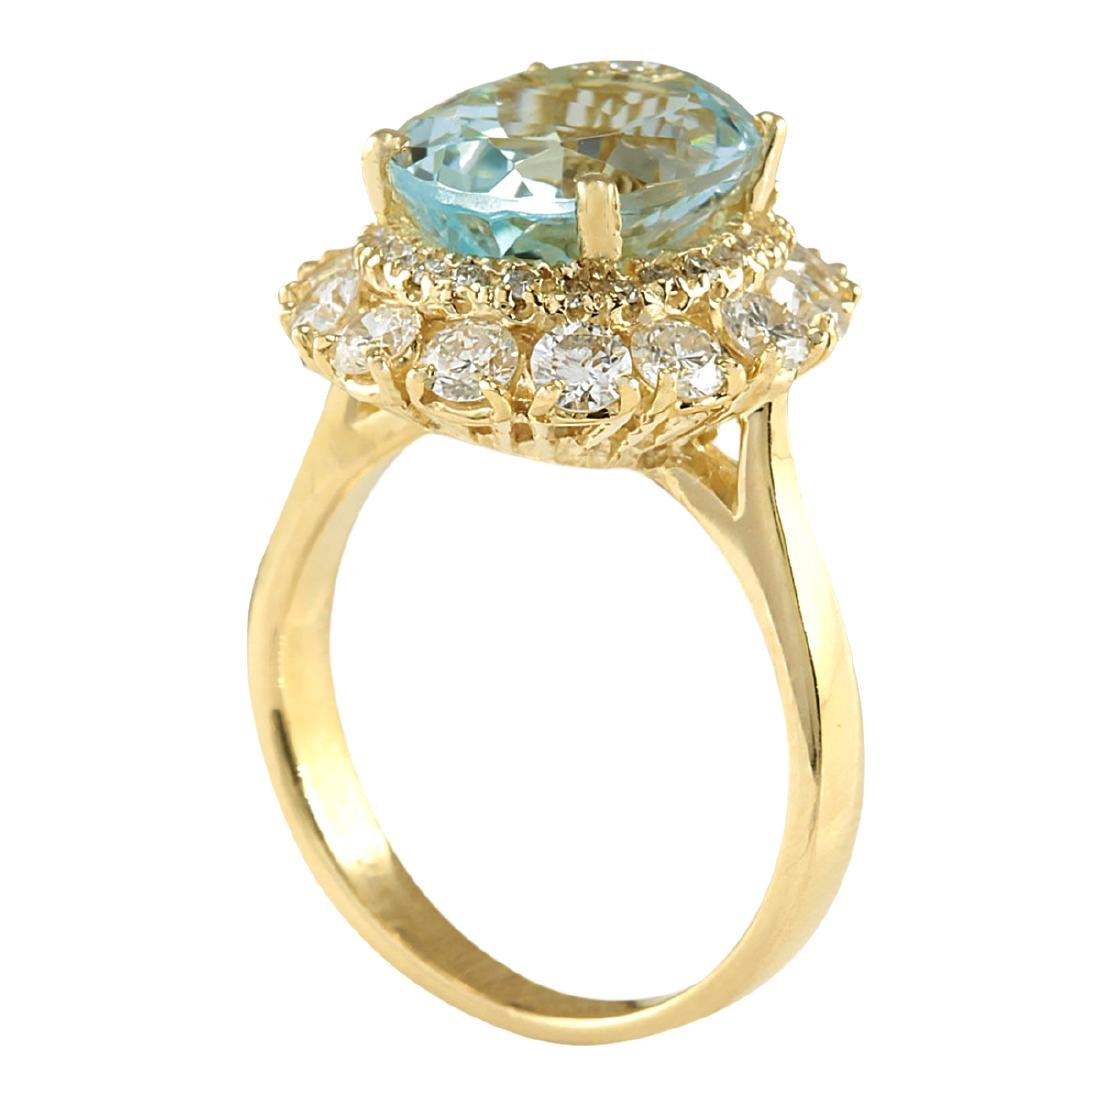 5.15CTW Natural Blue Aquamarine And Diamond Ring In 18K - 3